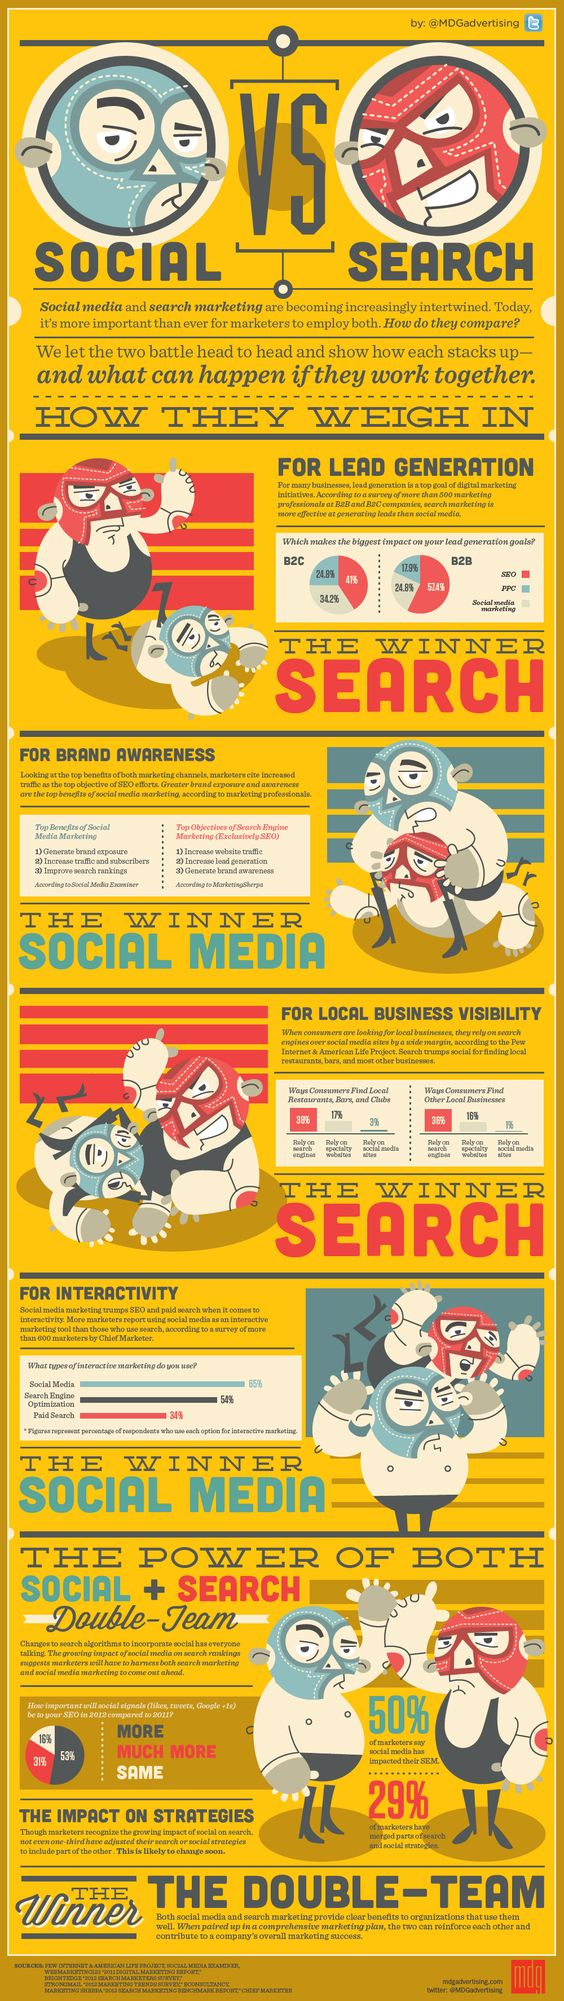 Social versus Search